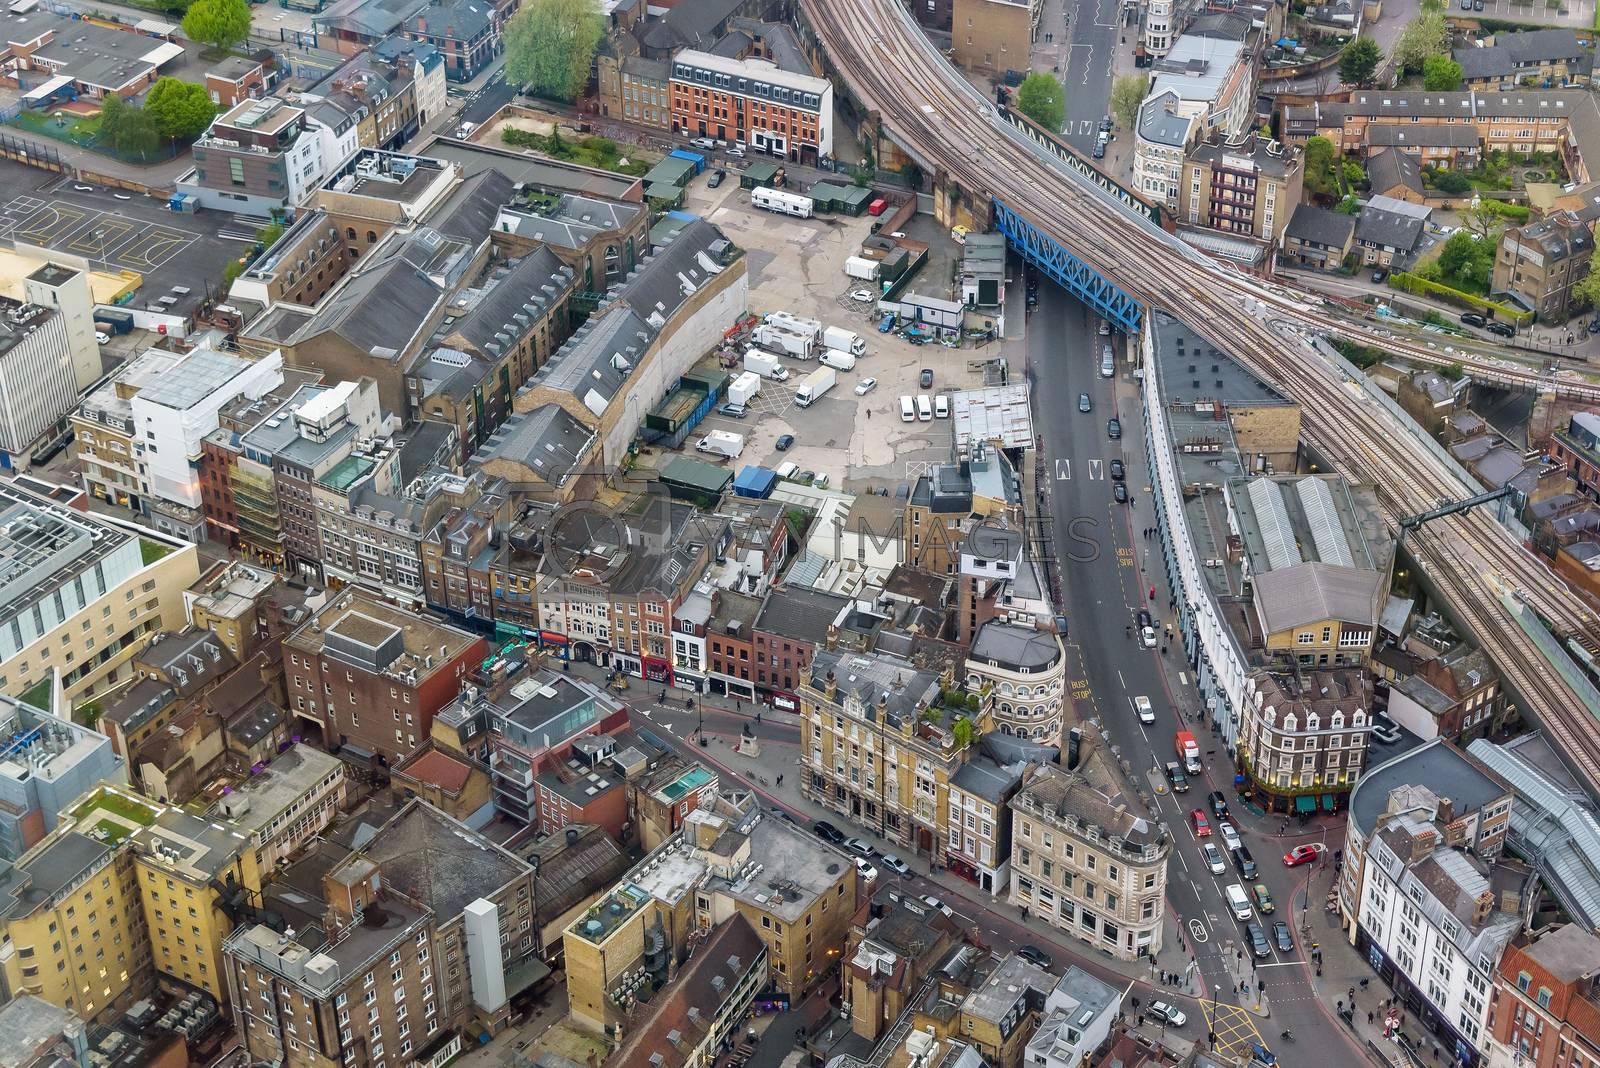 Royalty free image of Aerial view of Southwark Street in London by mkos83